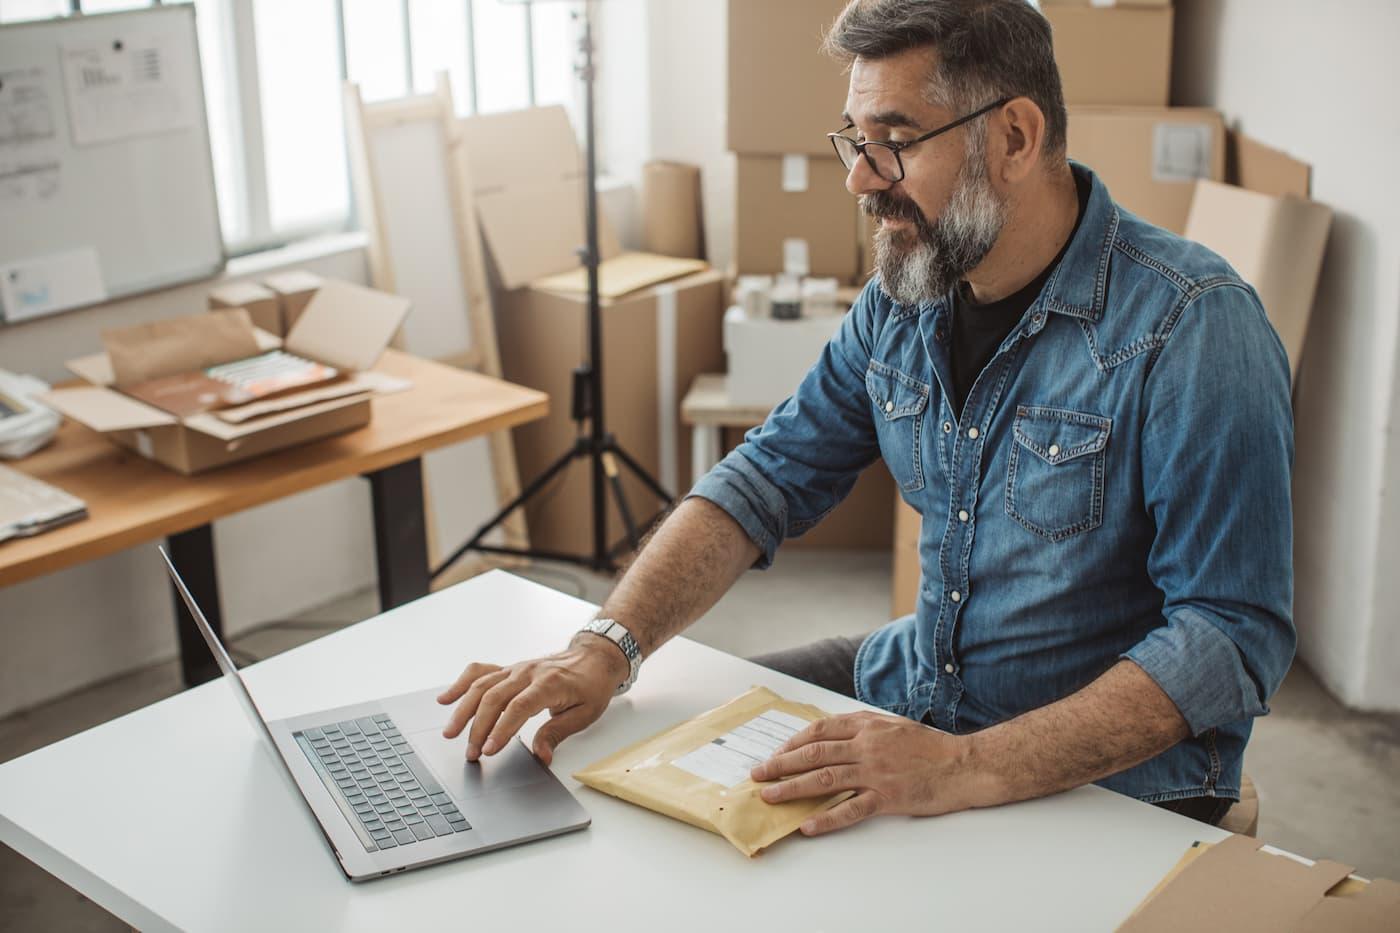 Man fulfilling online orders